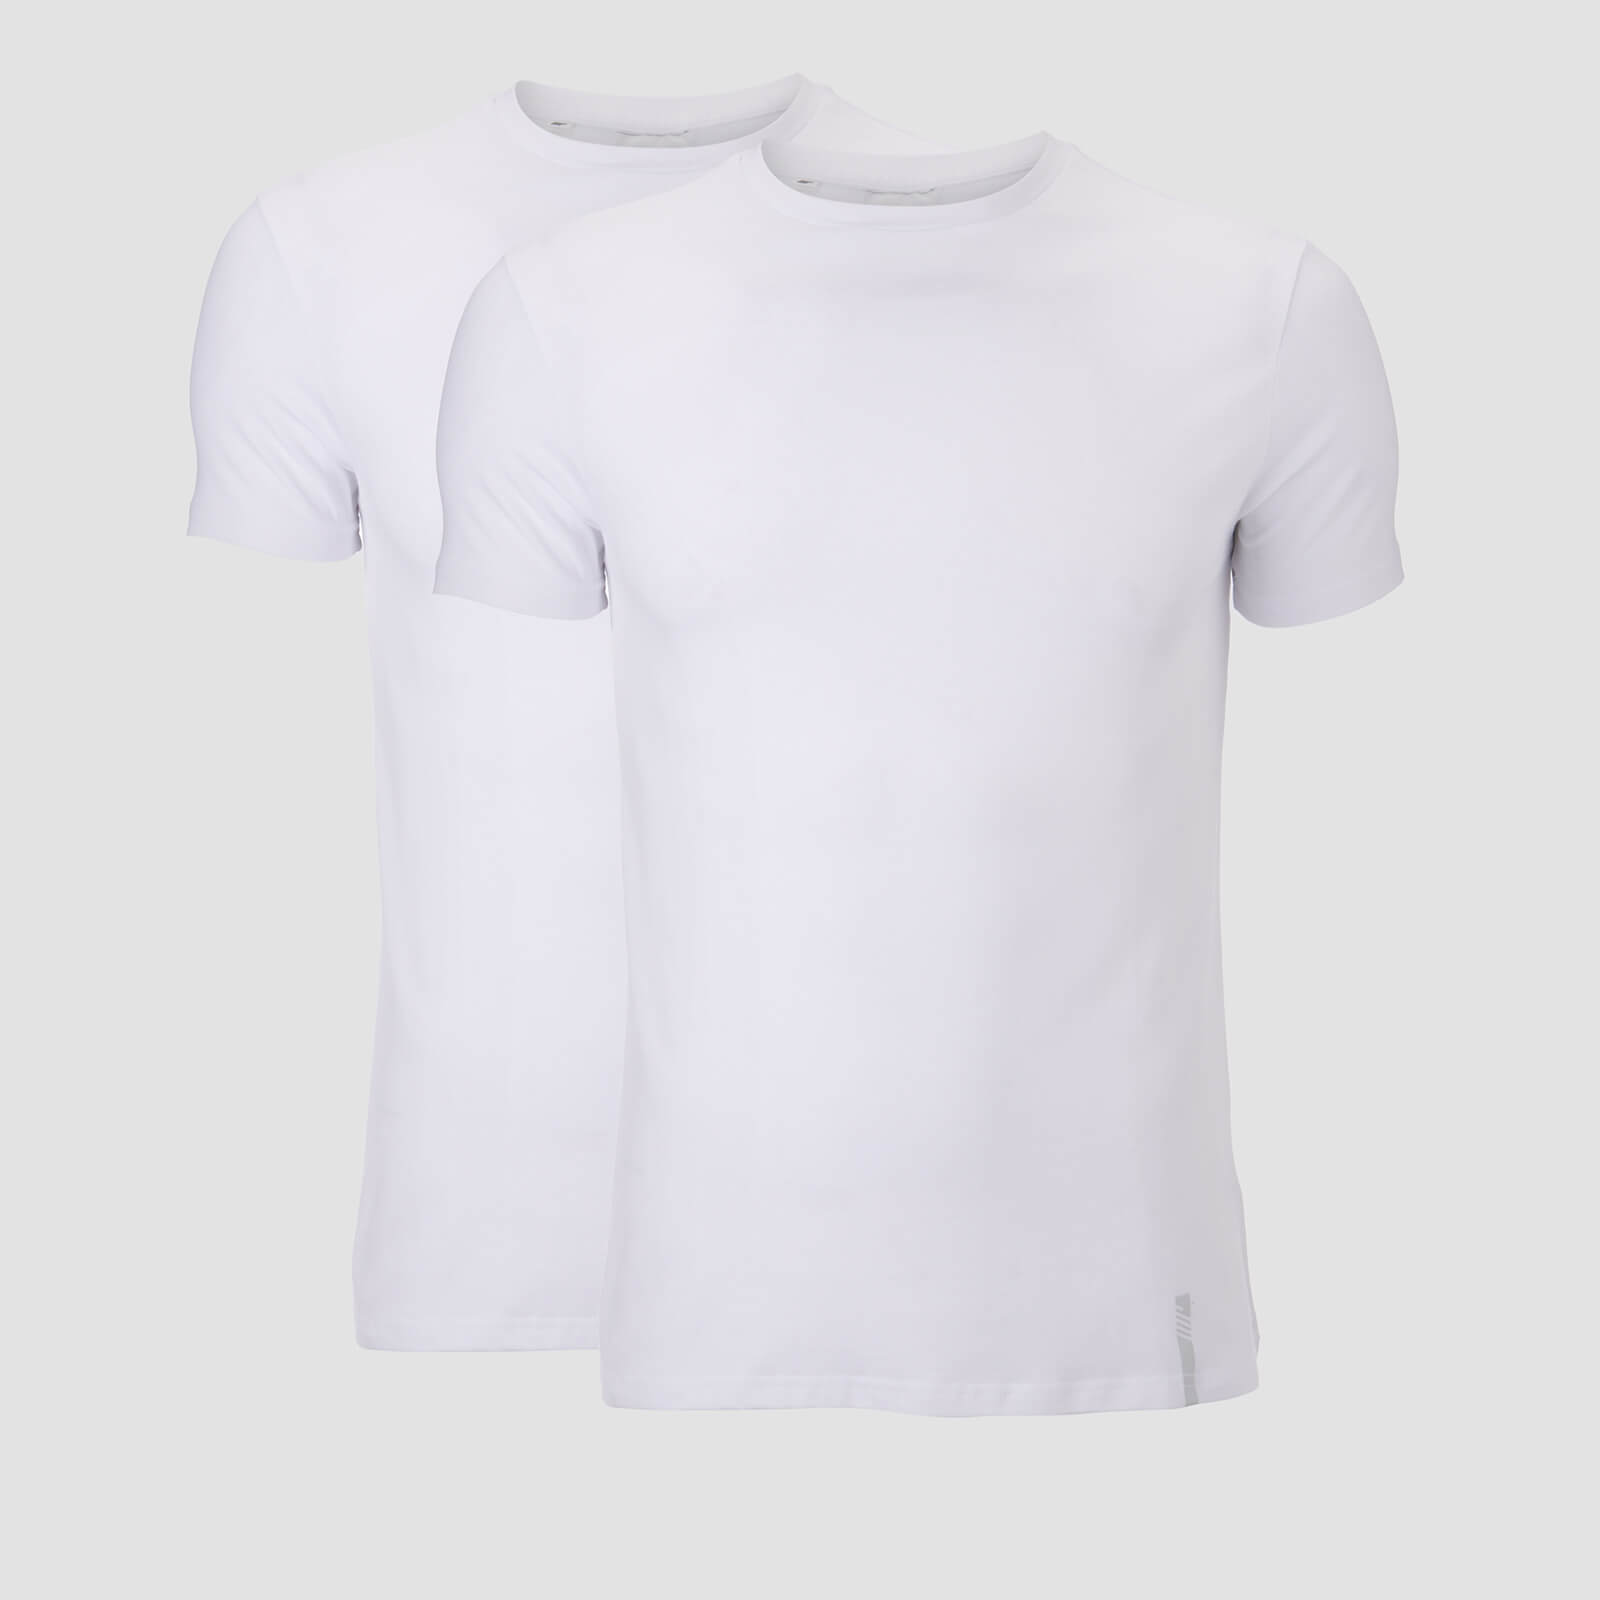 T-shirt Luxe Classic Pack de 2 - Blanc - M